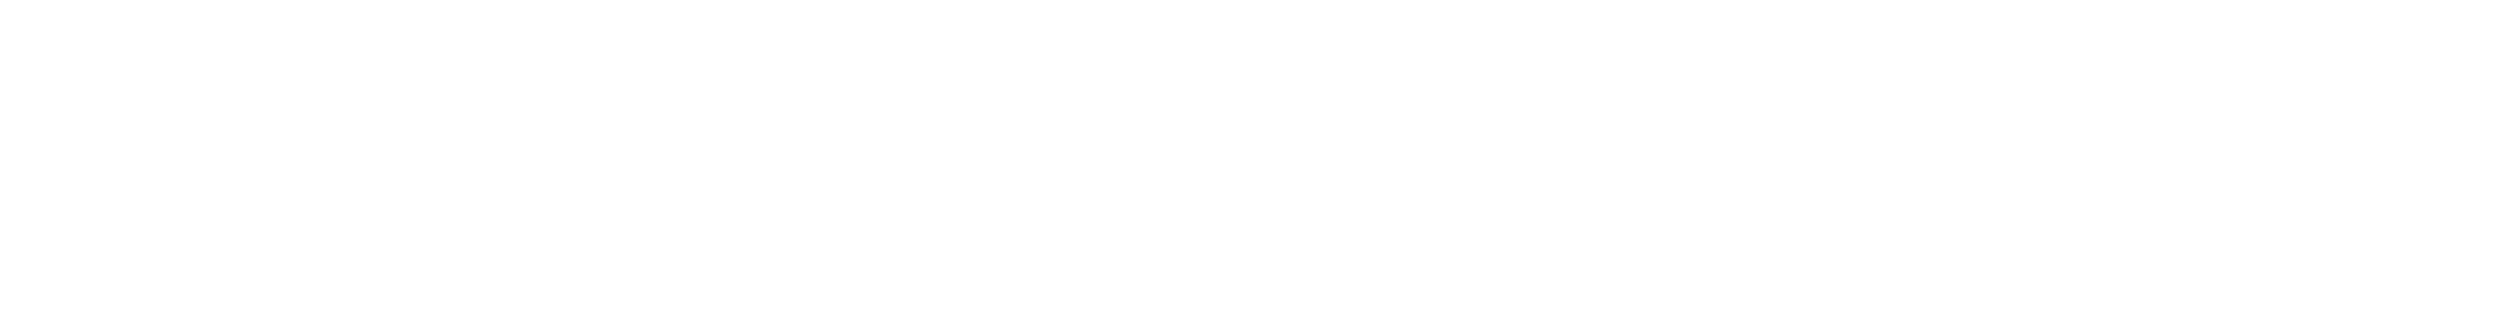 SenecaVC_Logo_Primary_White.png